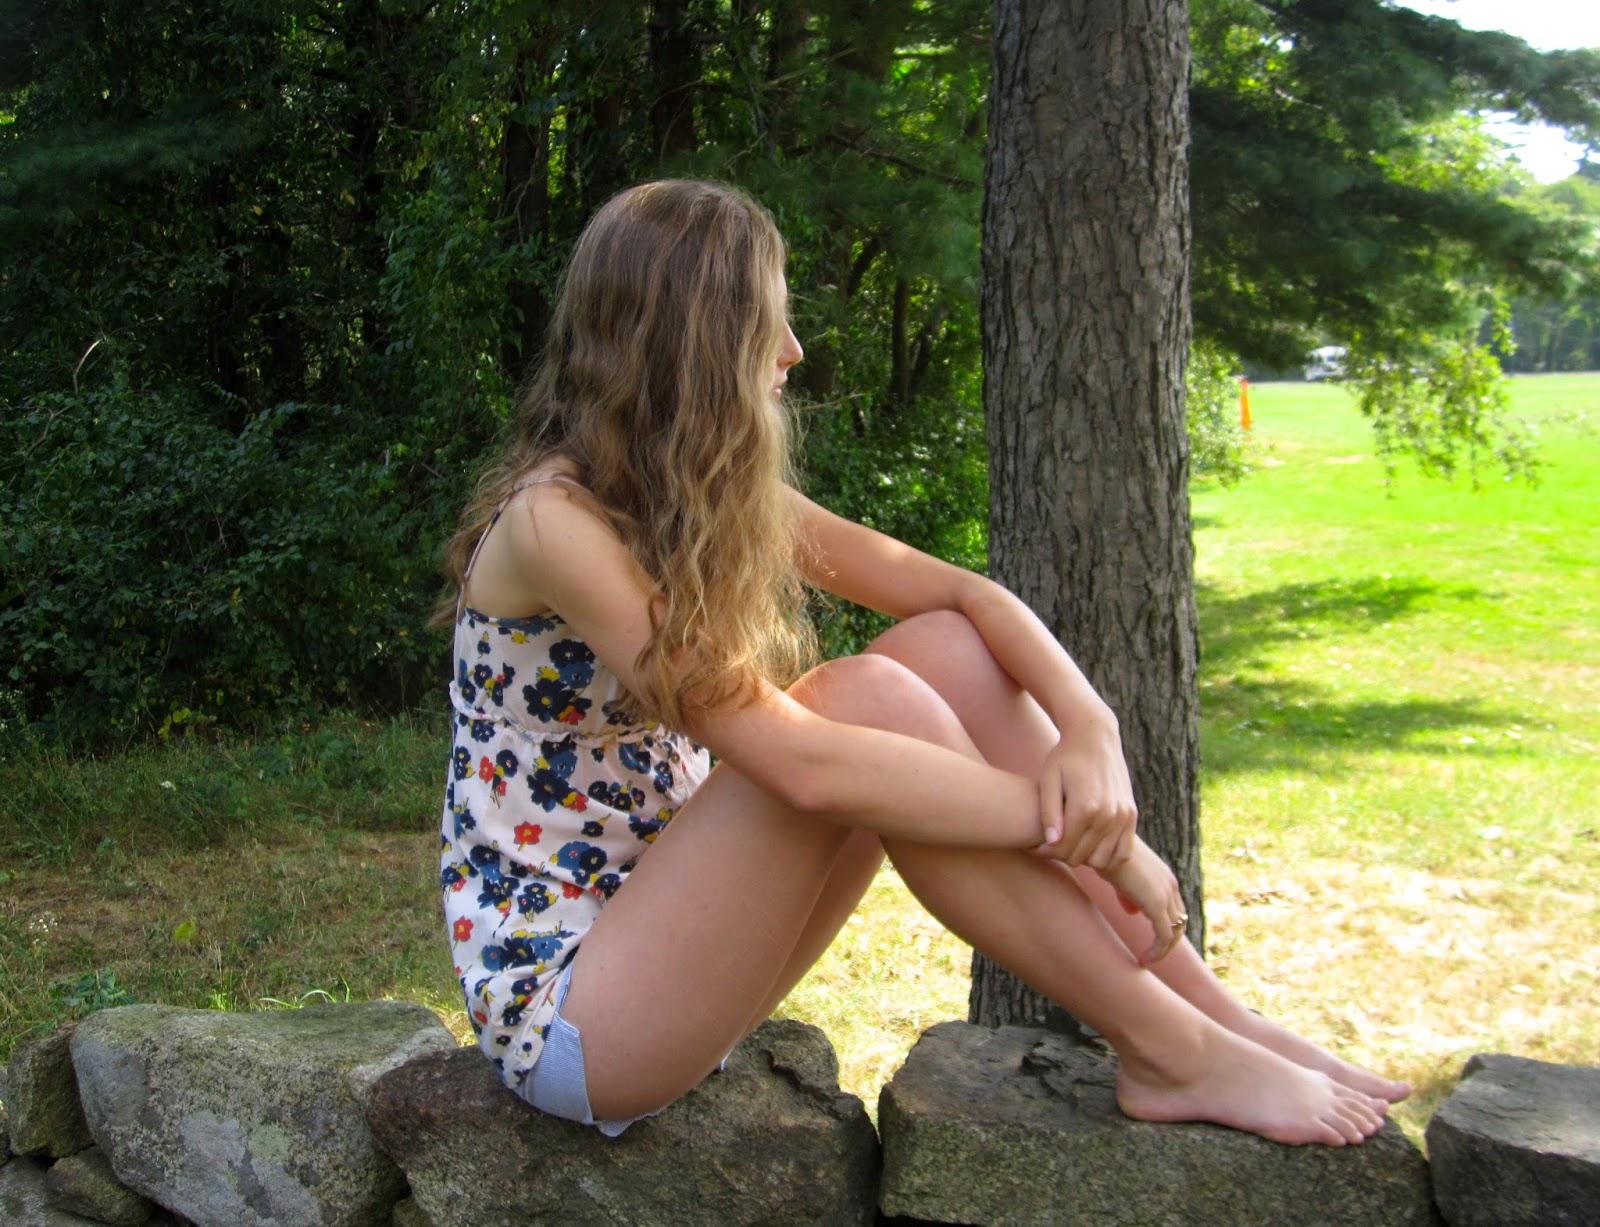 Cute young teen girl feet